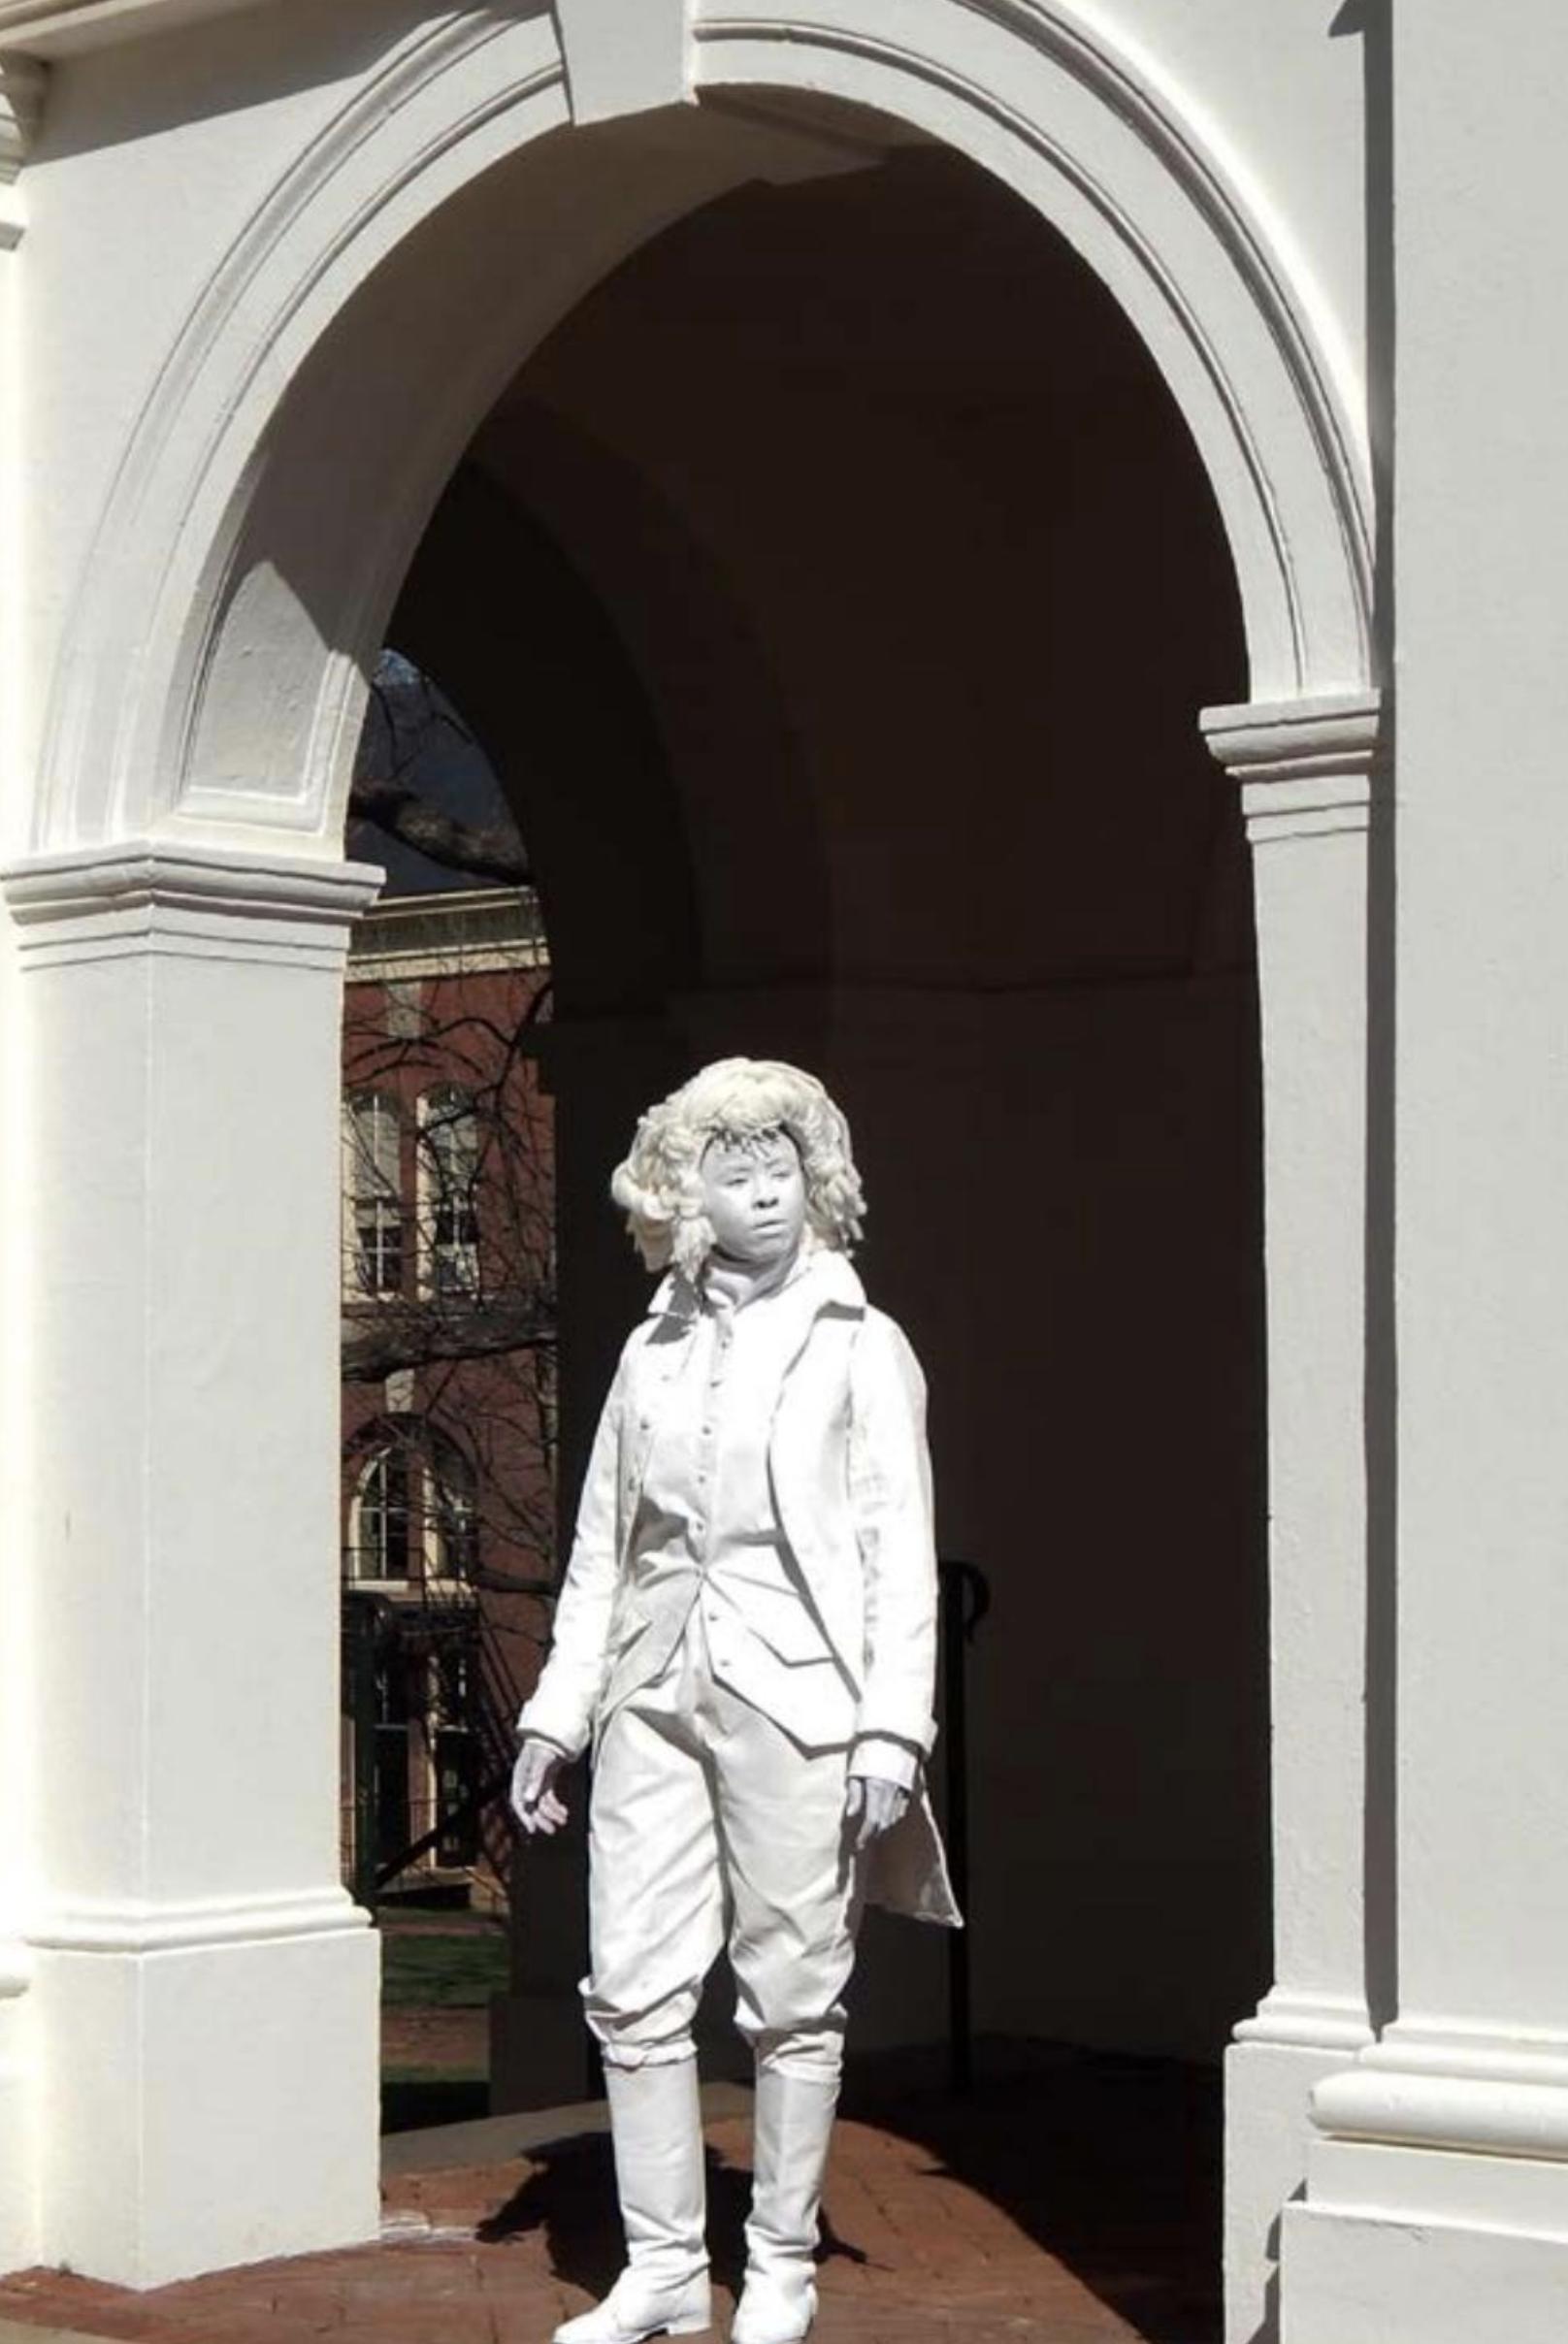 "Hartford Art School Galleries_Marisa Williamson_The Ghost of Thomas Jefferson2_2018_Performance documentation (digital prints)_8"" x 10""_Price in USD.png"